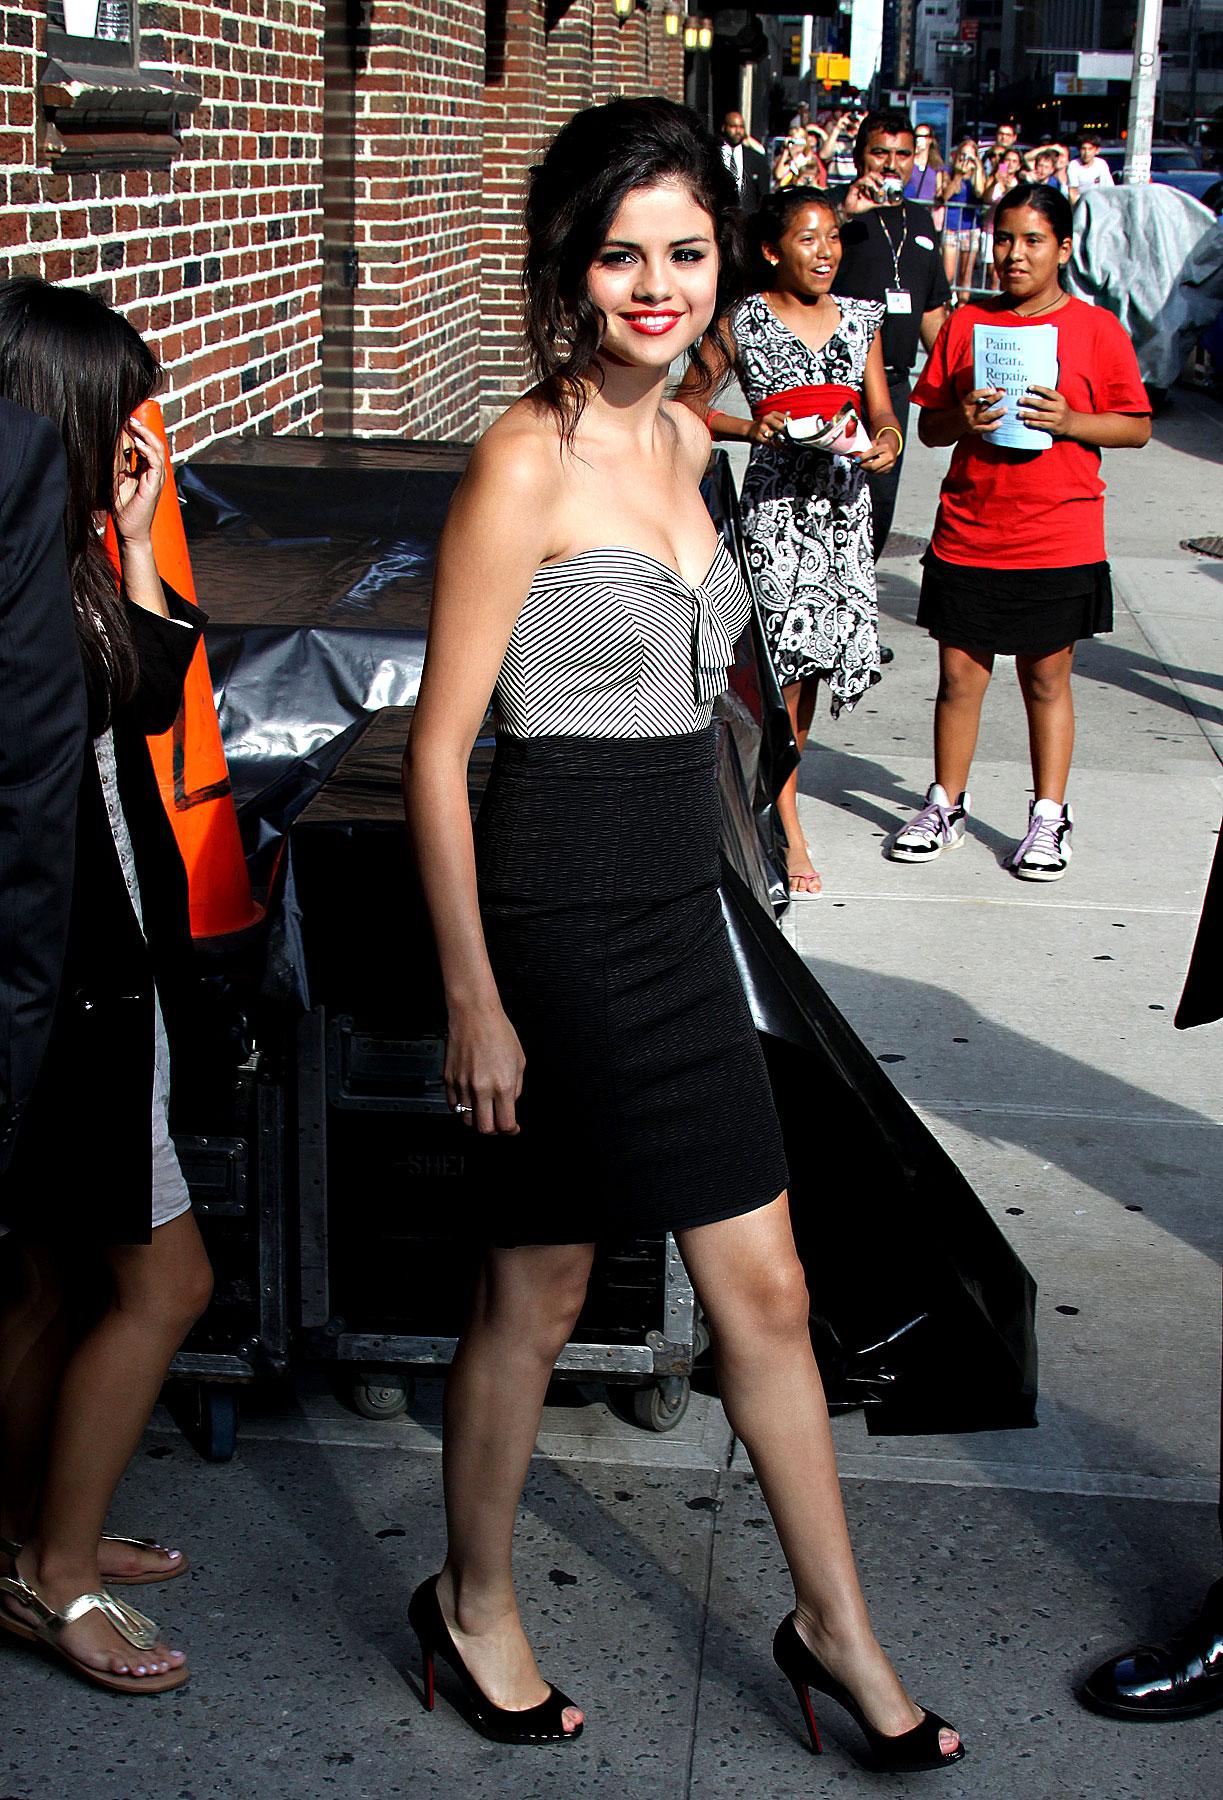 Selena Gomez's New Mature Style: Yay or Nay? (PHOTOS)